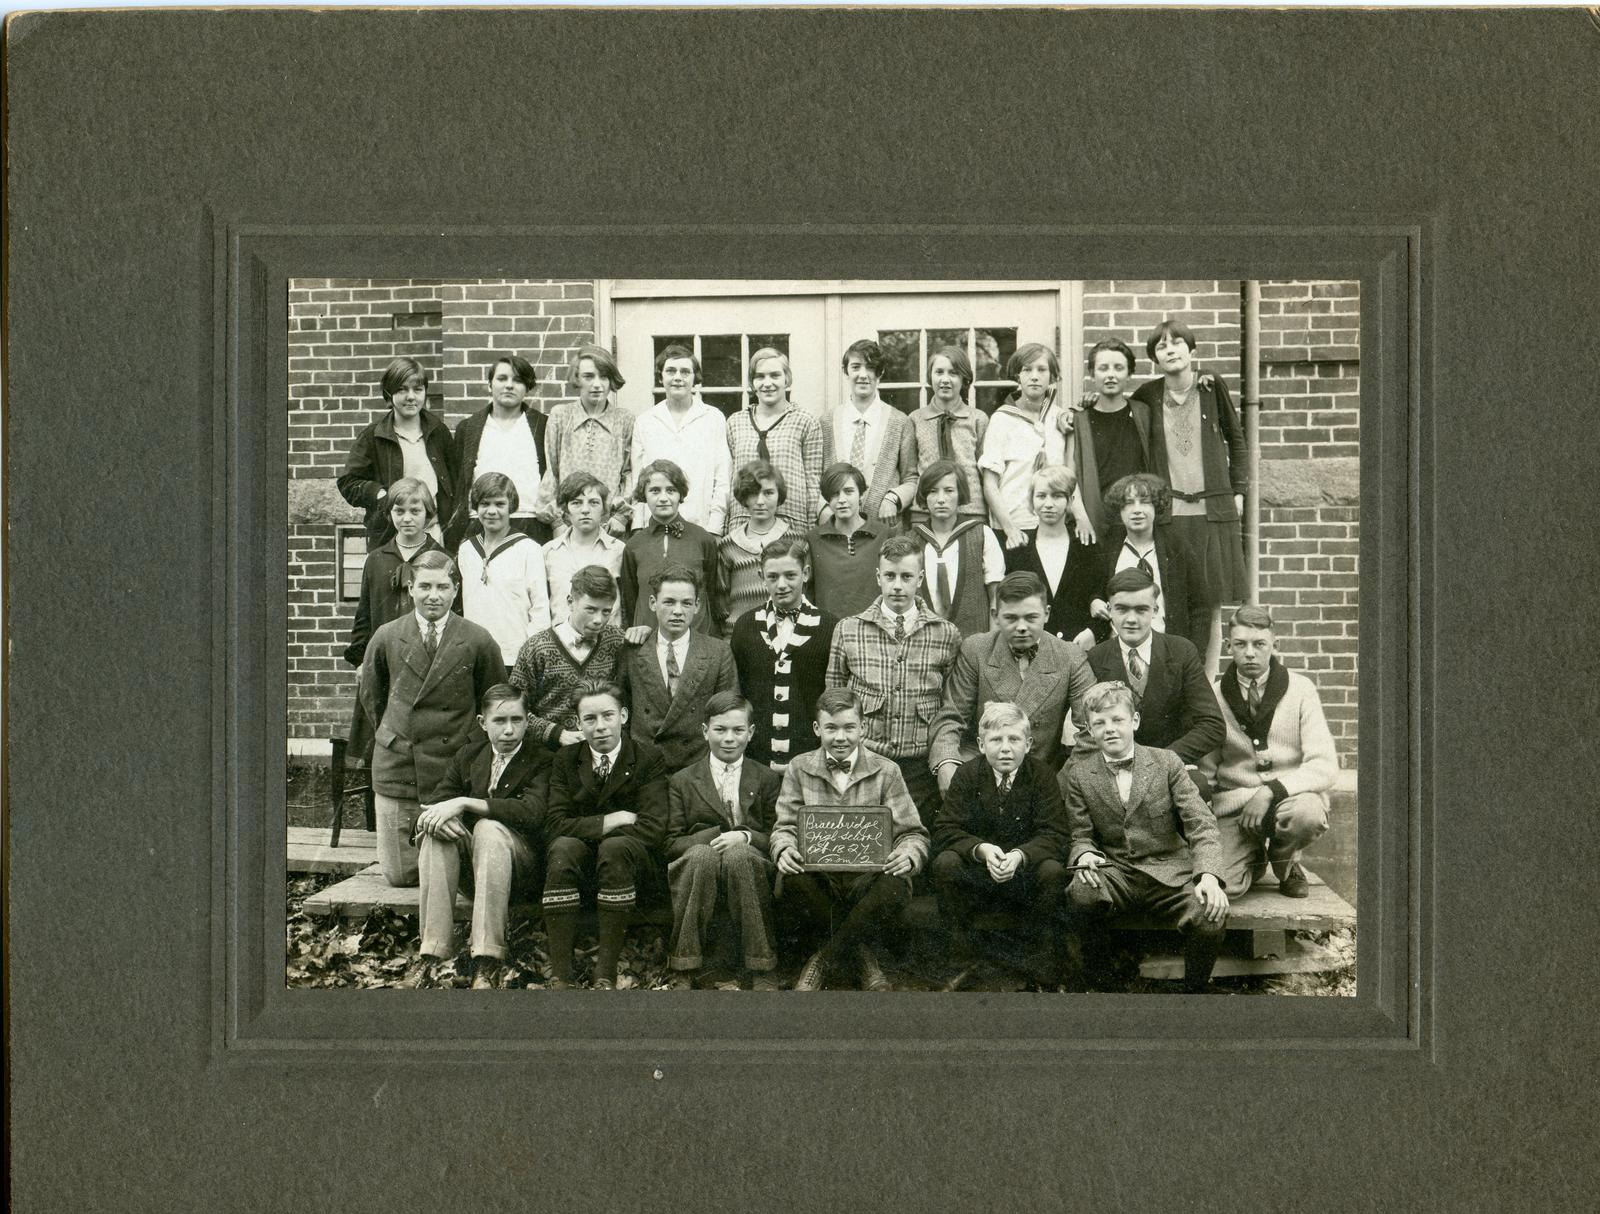 Bracebridge High School class 1927